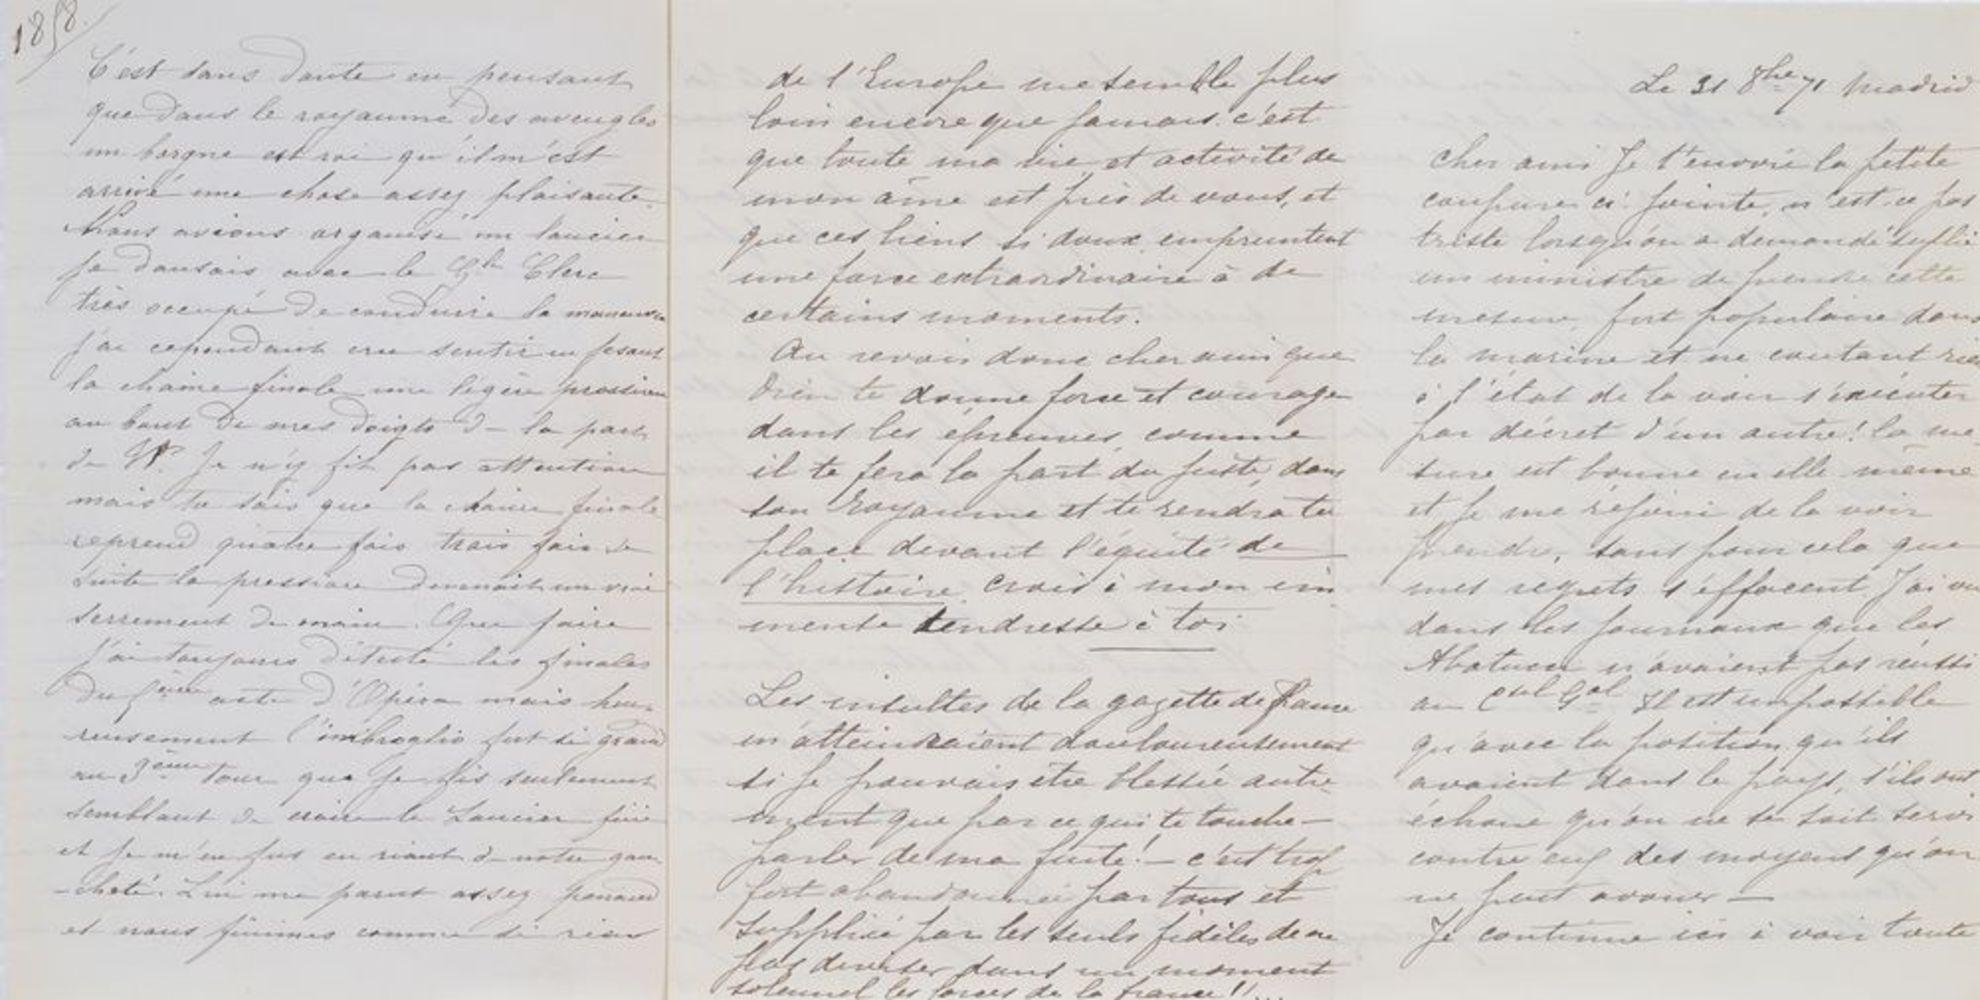 Manuscripts, Photographs & Rare books